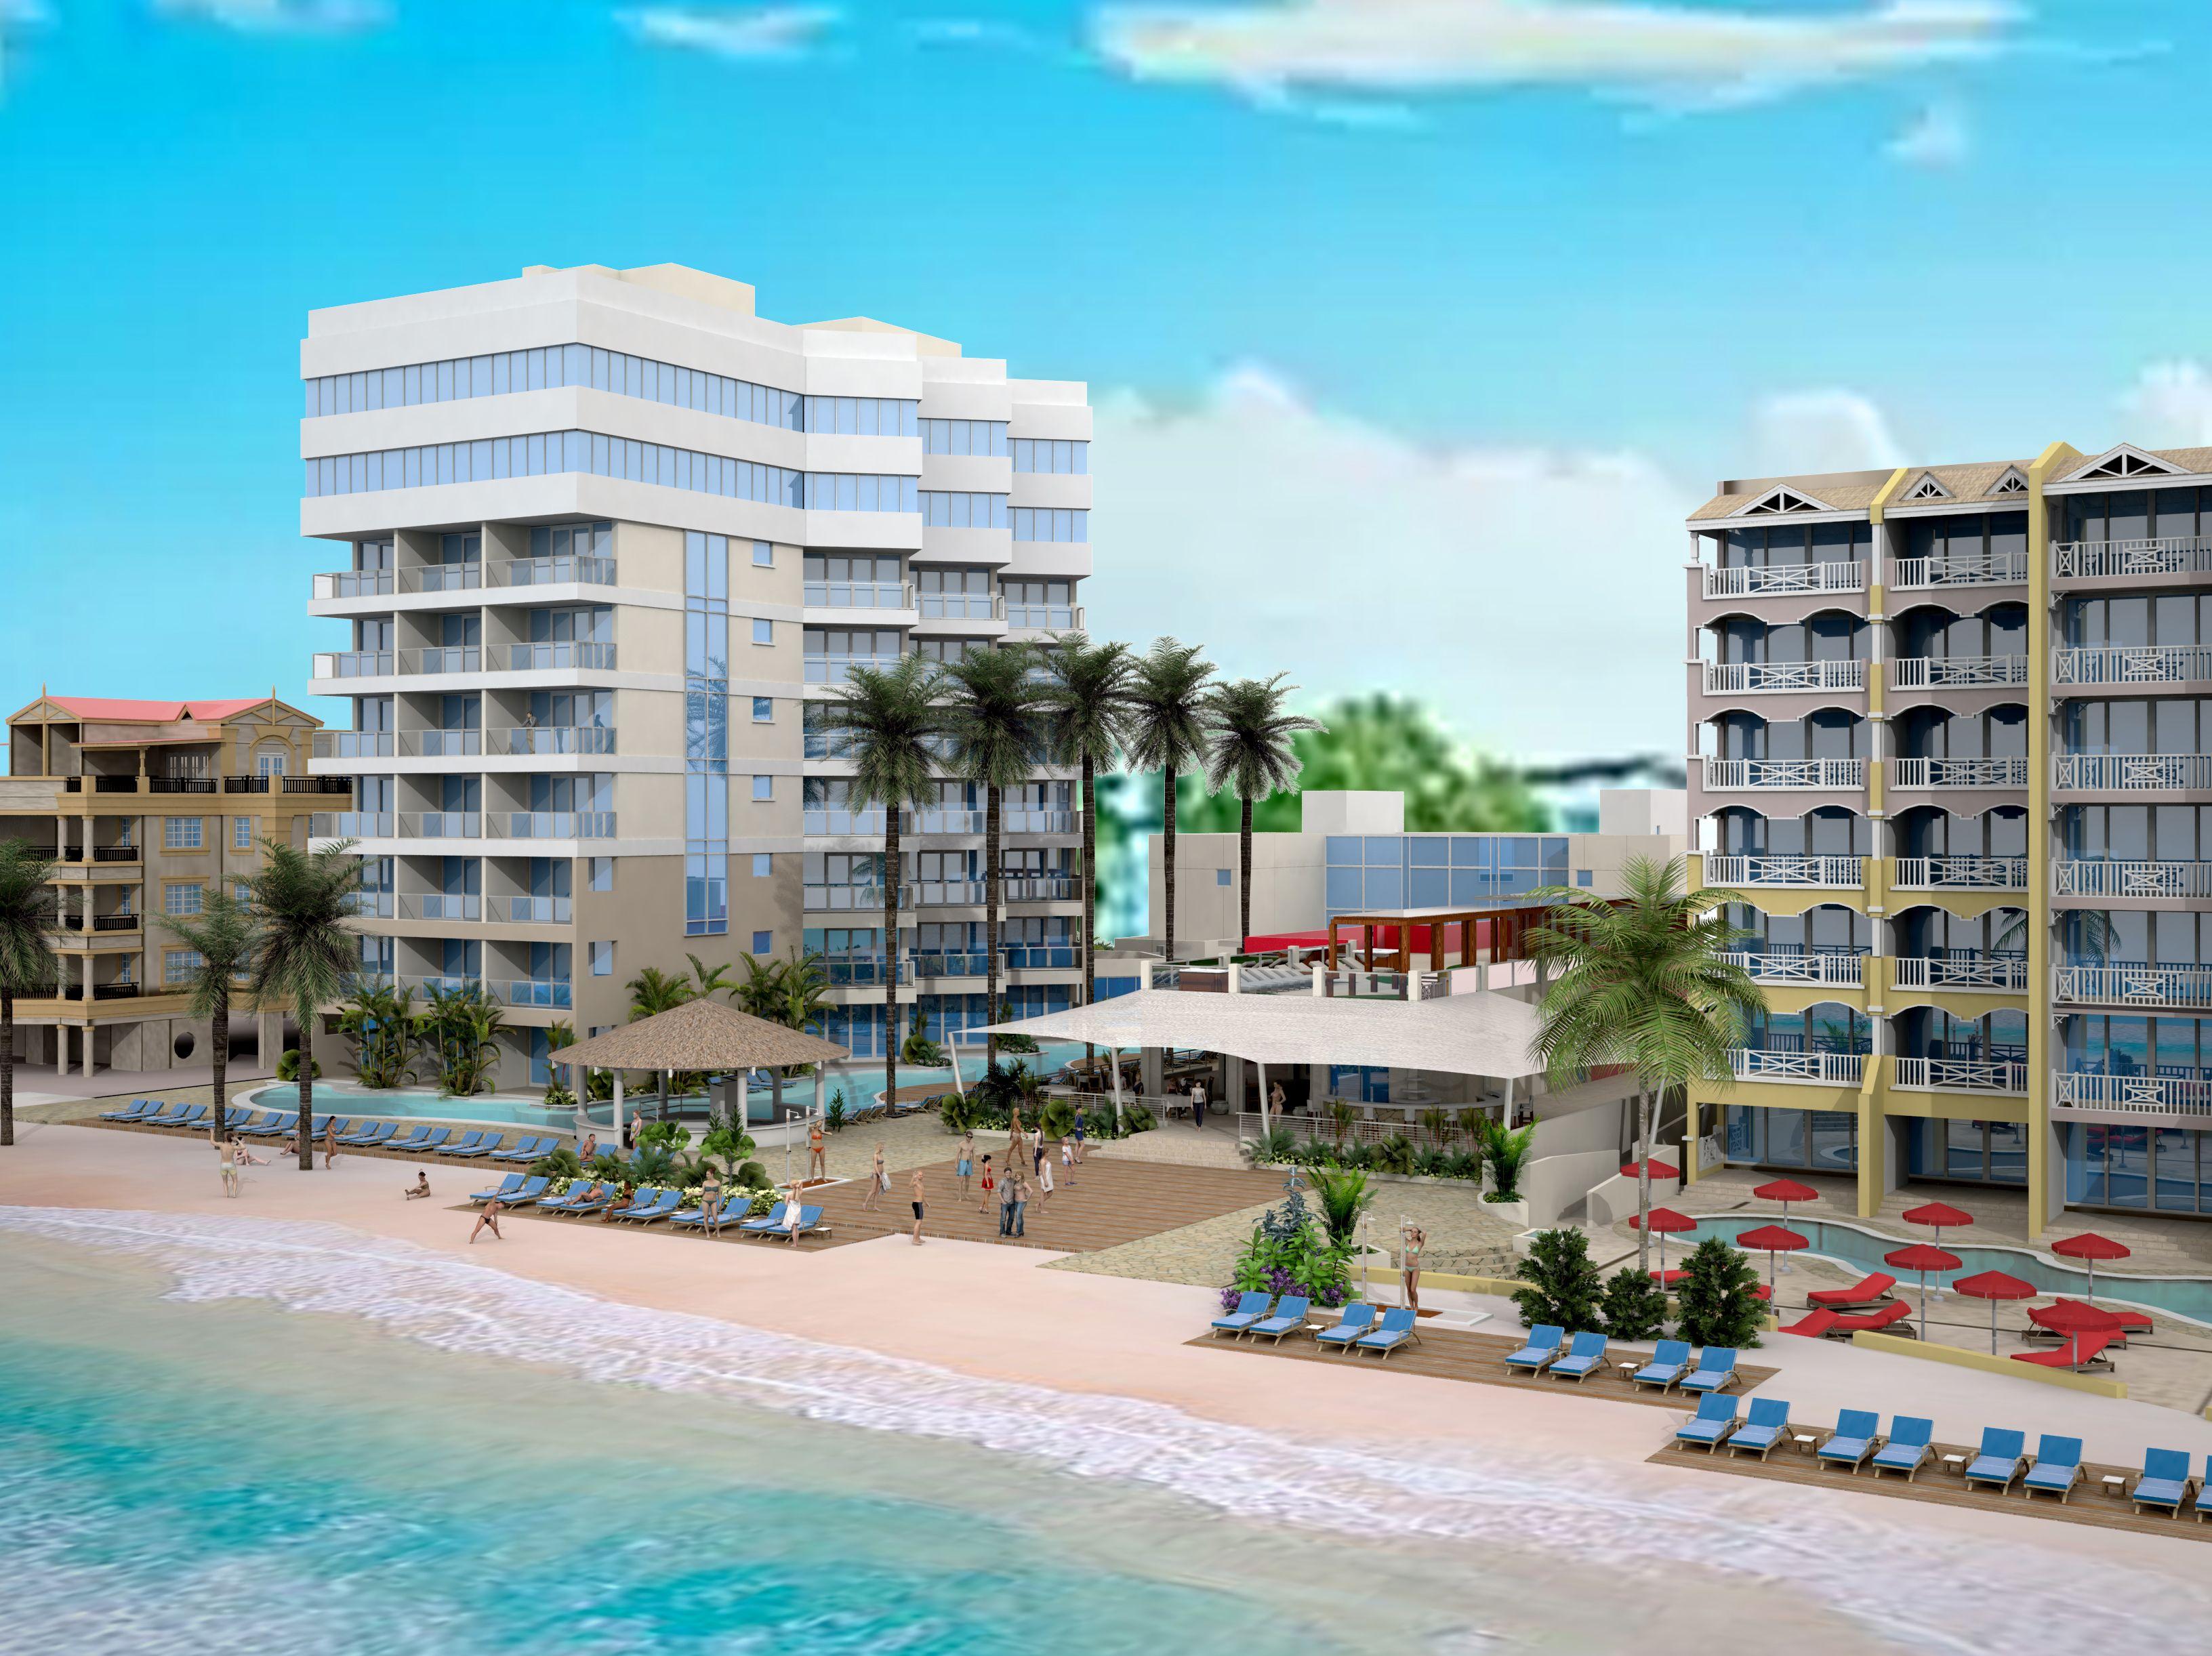 O2 Beach Club & Spa Artist Image